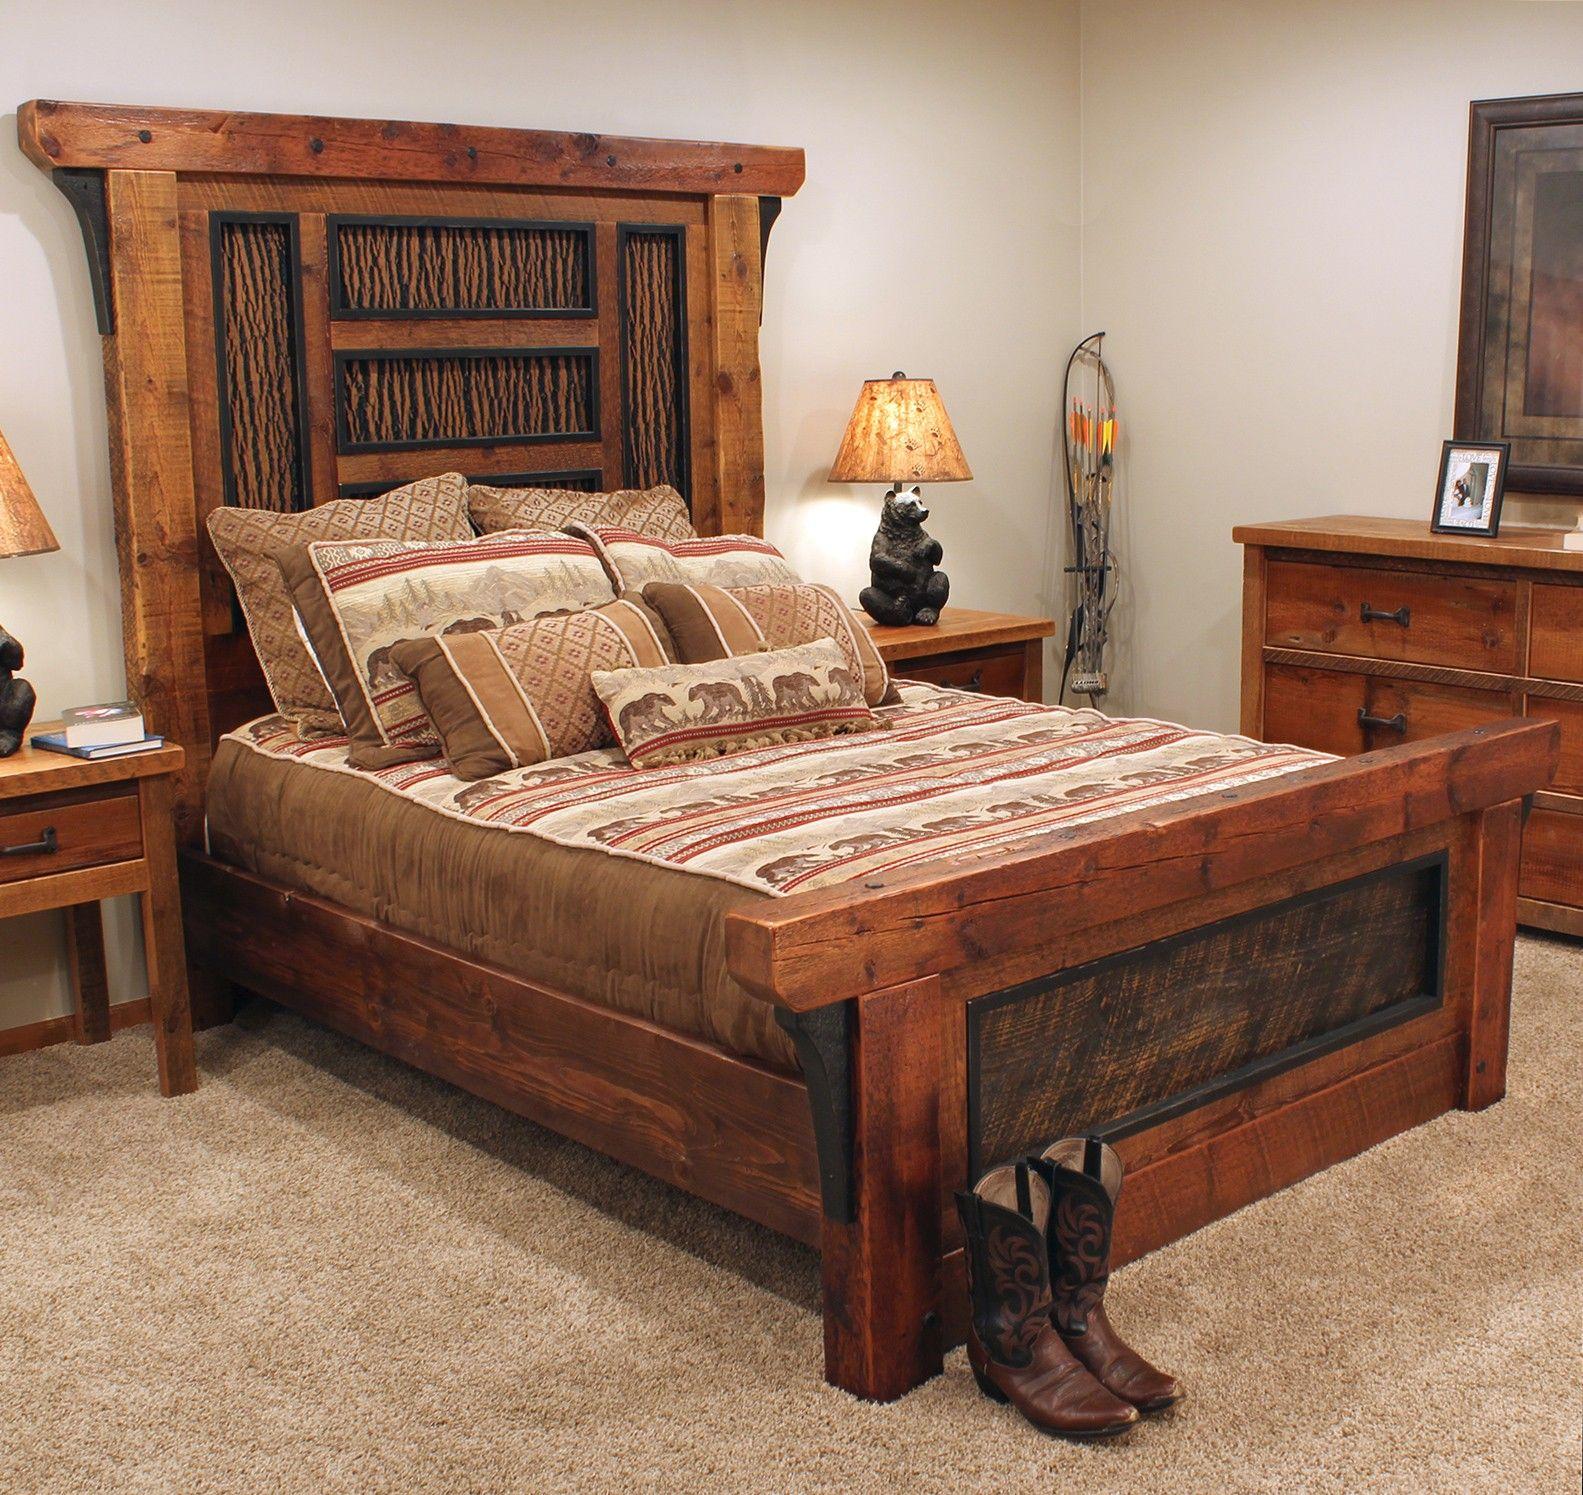 Black creek timber frame bed beds pinterest timber wood barn